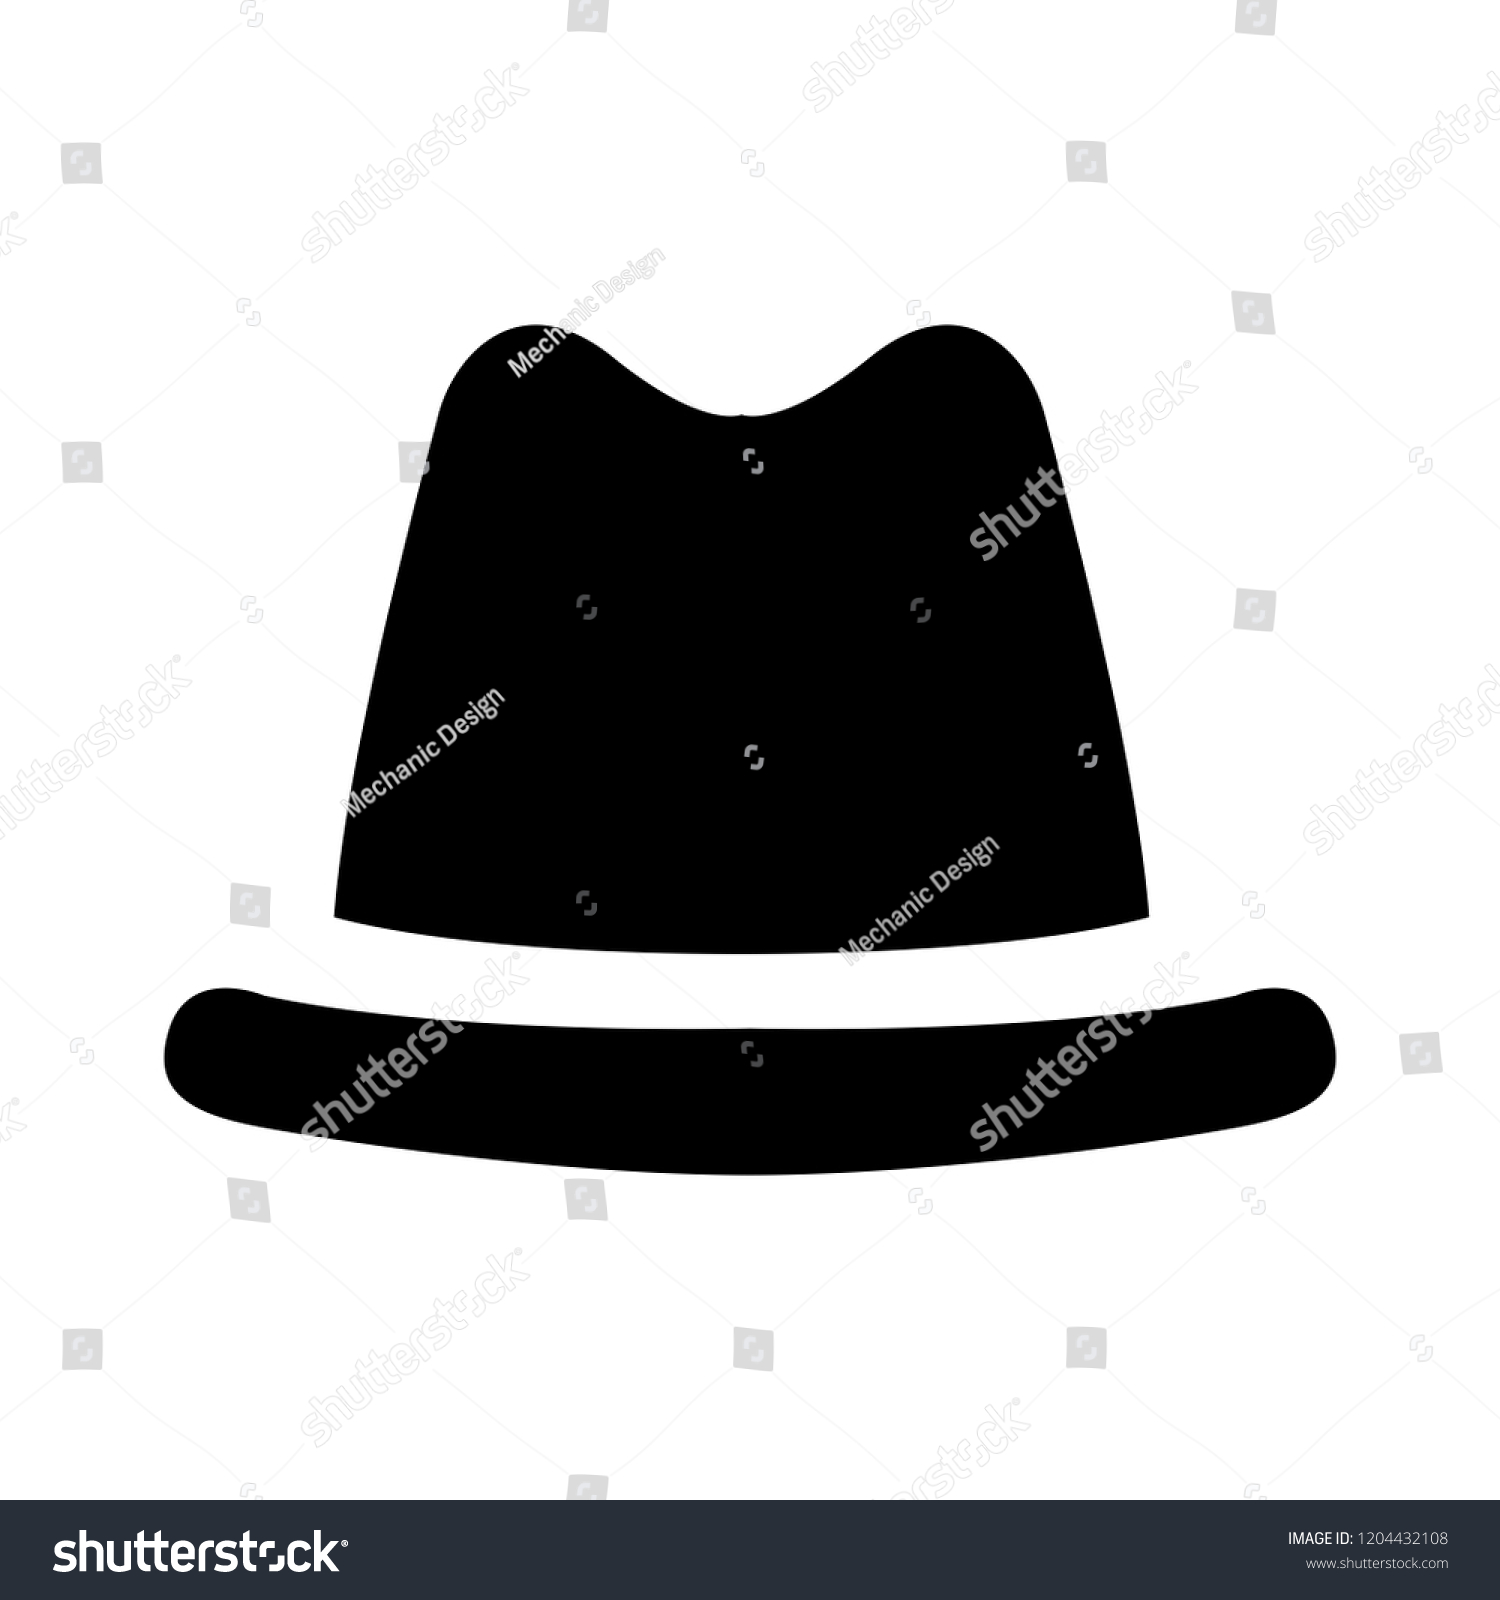 SOLOVEDRESS Mens 3 Pieces Formal Mens Suit One Button Groomsmen Blazer Vest ST070